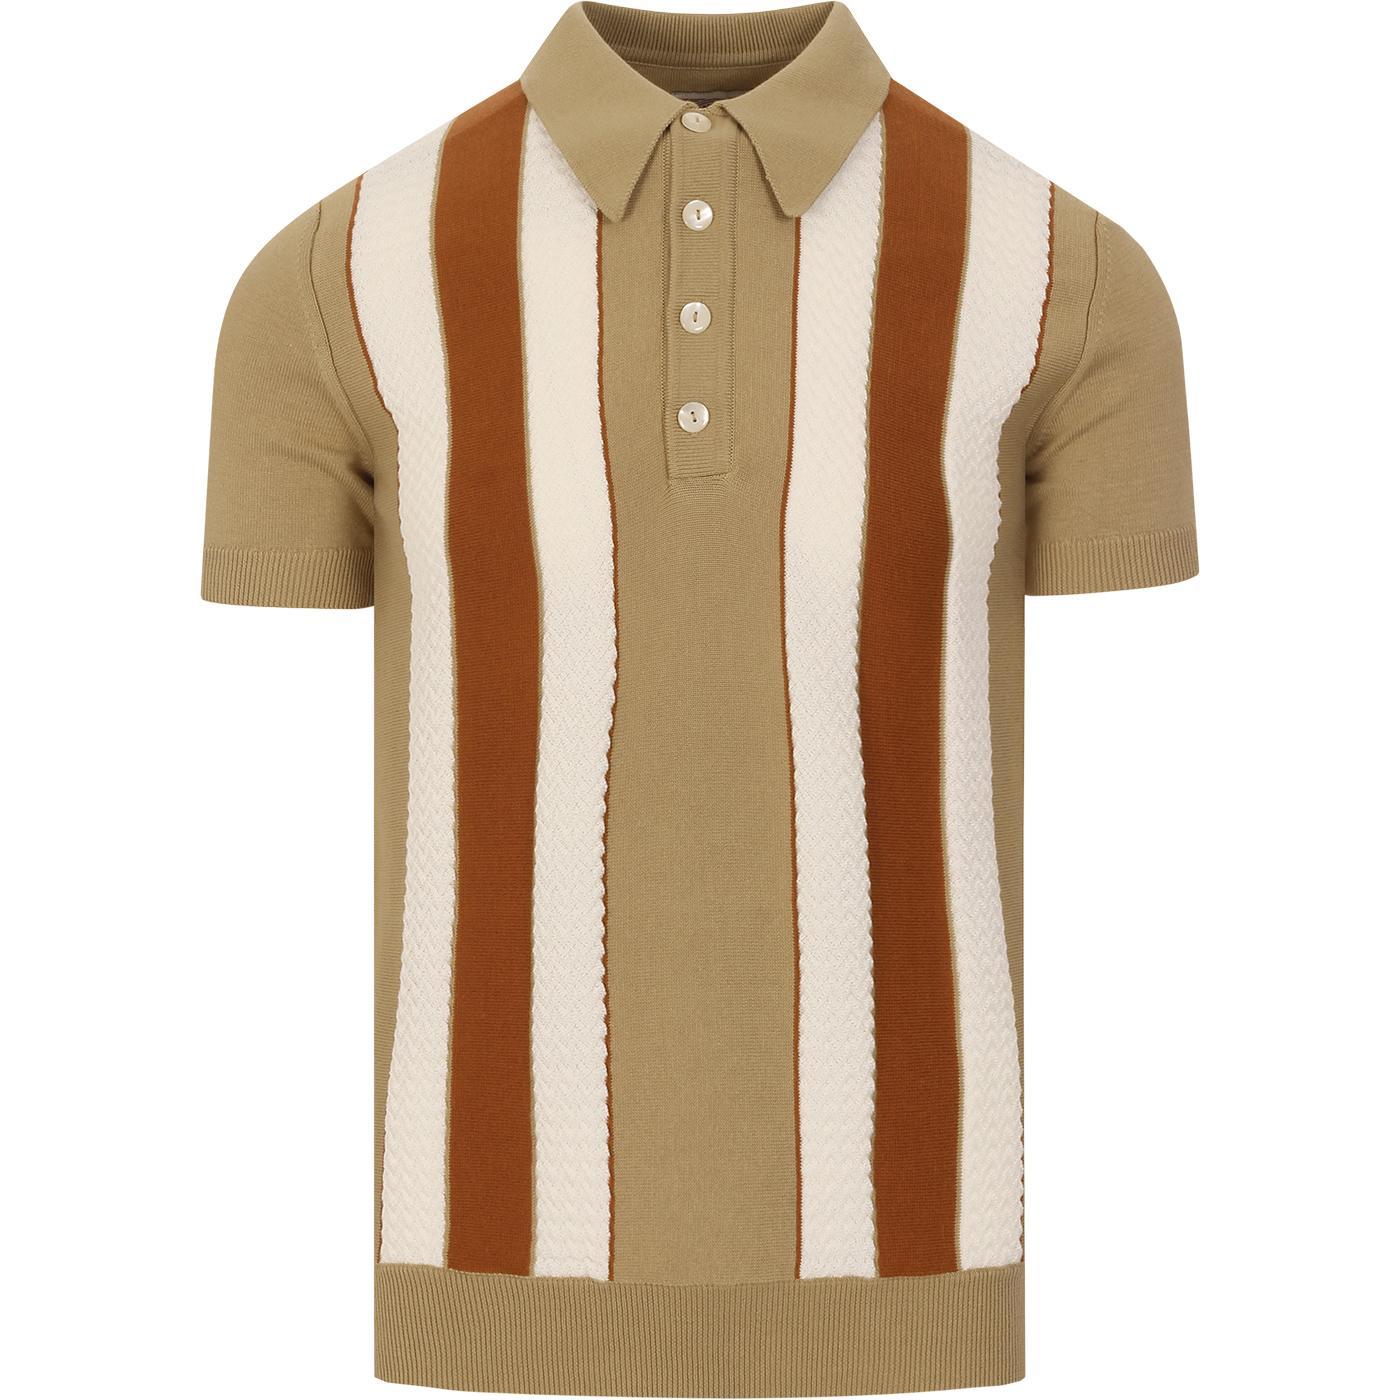 SKA & SOUL Mod Textured Stripe Knit Polo Top SAND